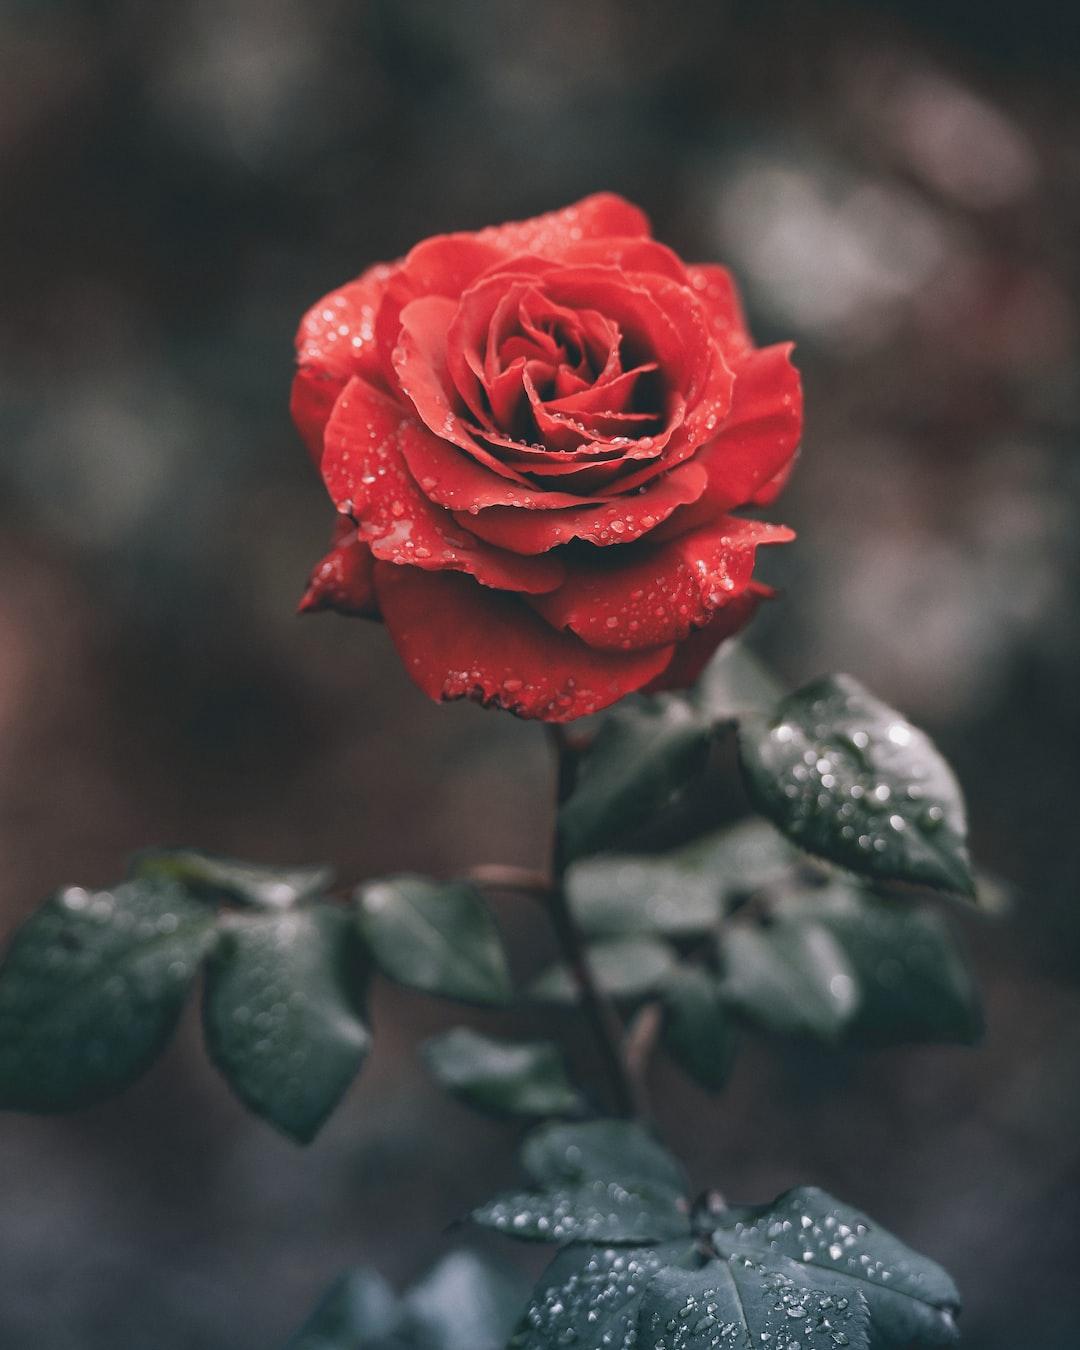 Wet Red Rose Photo By Ameen Fahmy Ameenfahmy On Unsplash